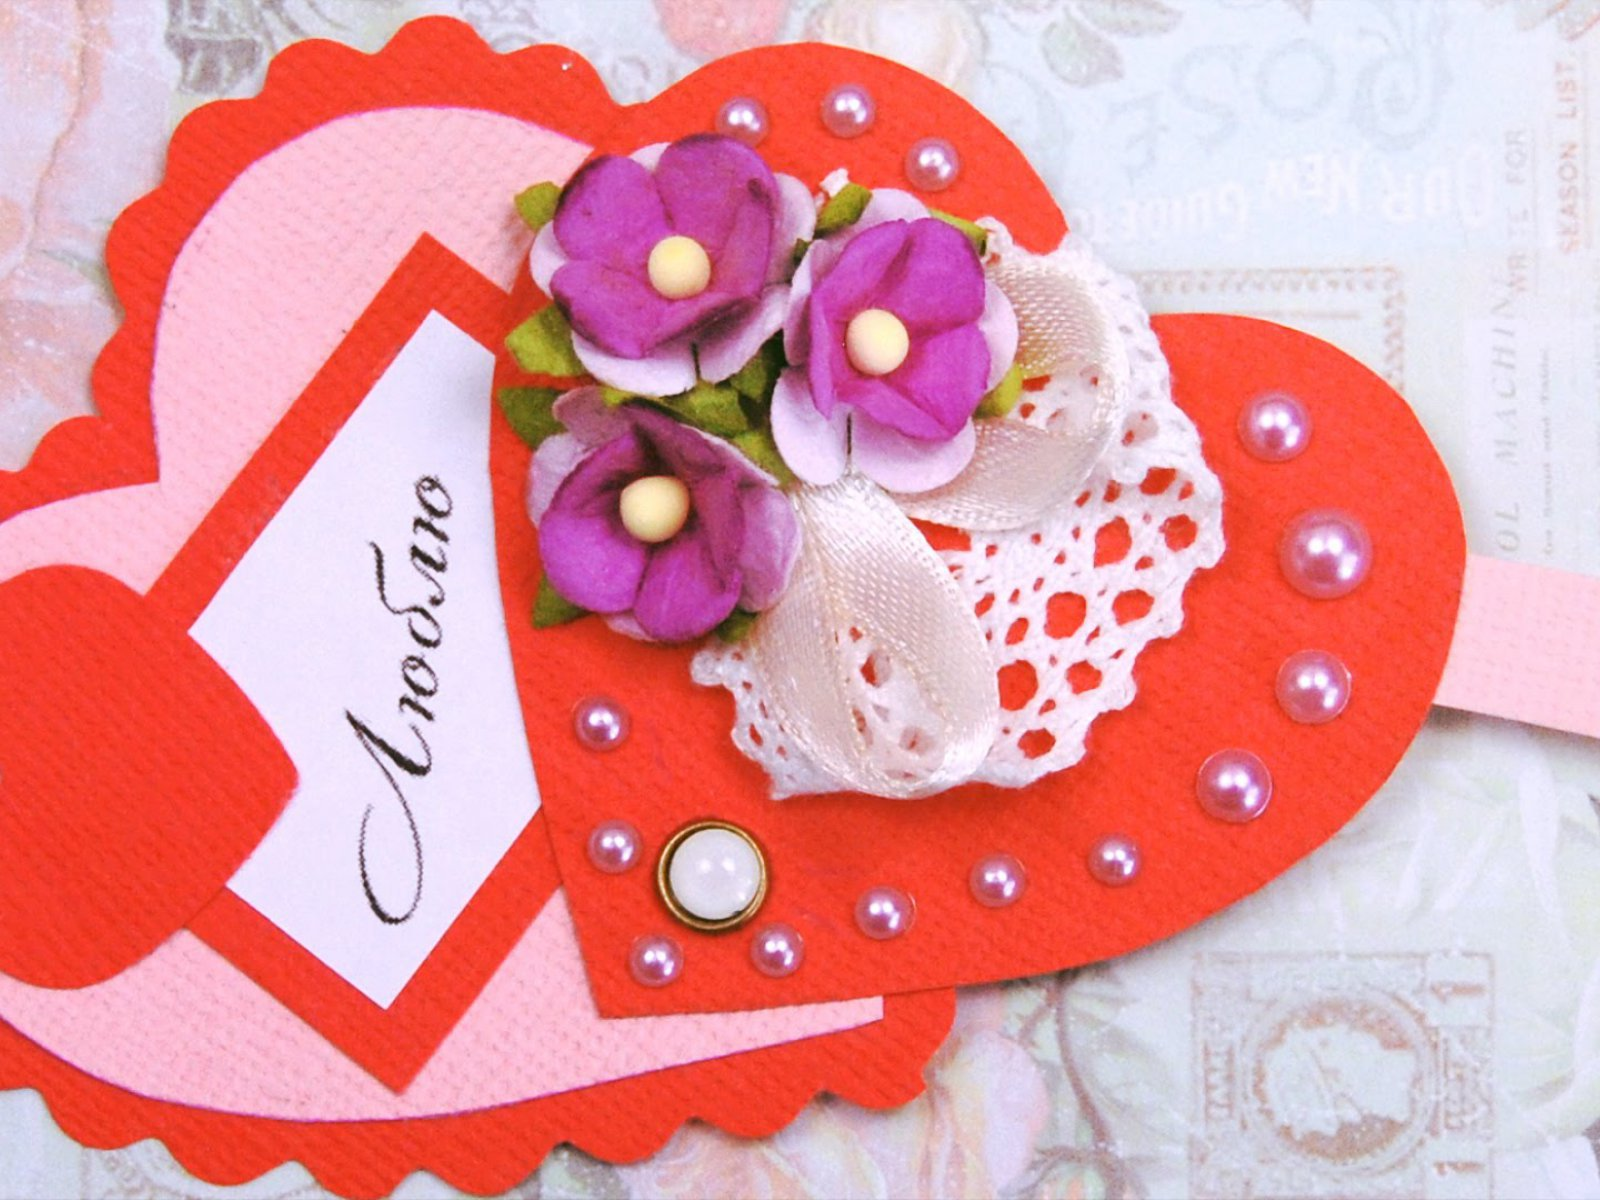 Открытки своими руками мастер-класс валентинки